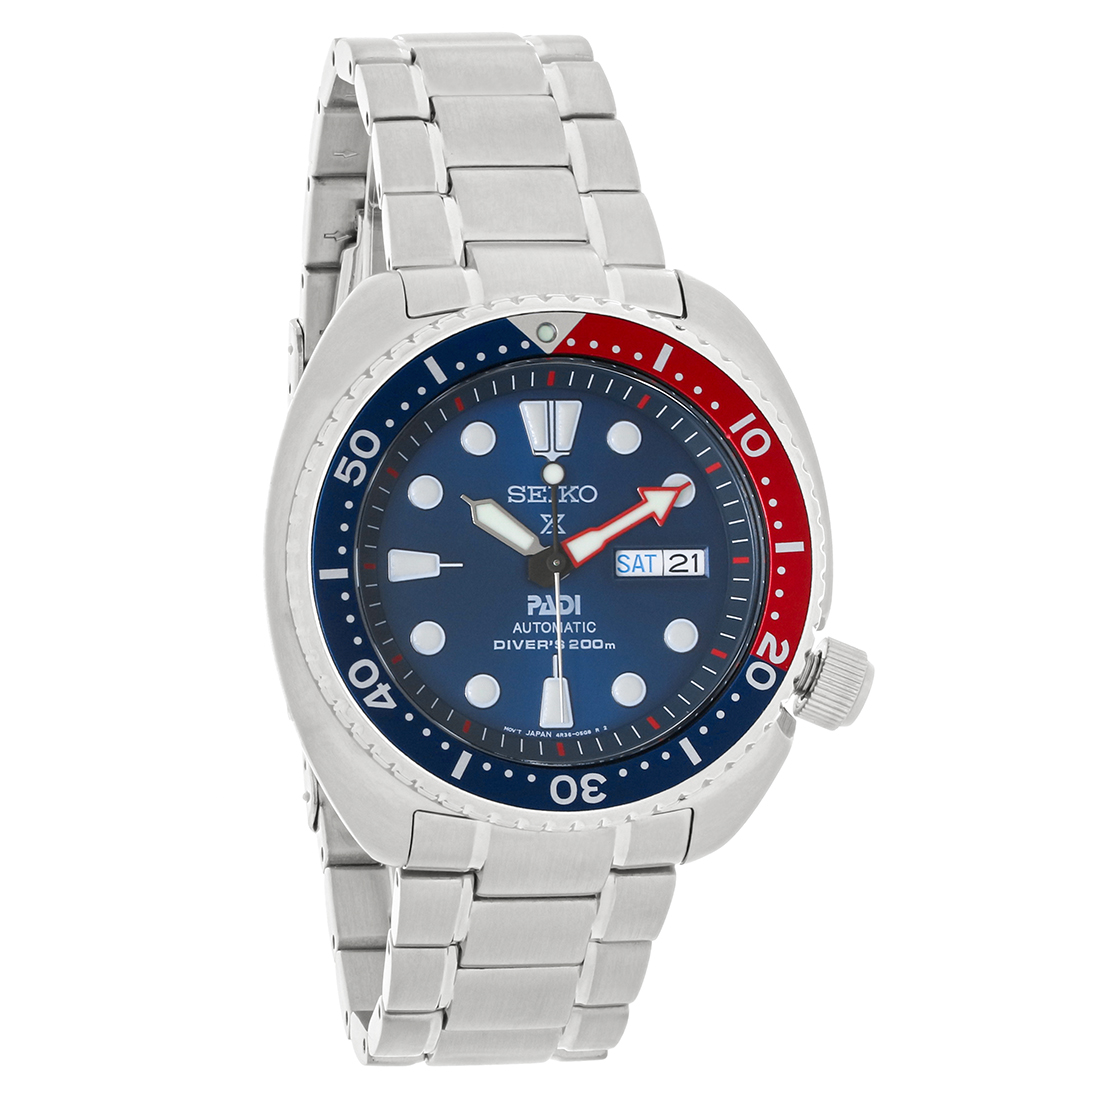 Seiko Prospex PADI Diver Mens Automatic Special Edition Watch SRPA21 f21742dfc6